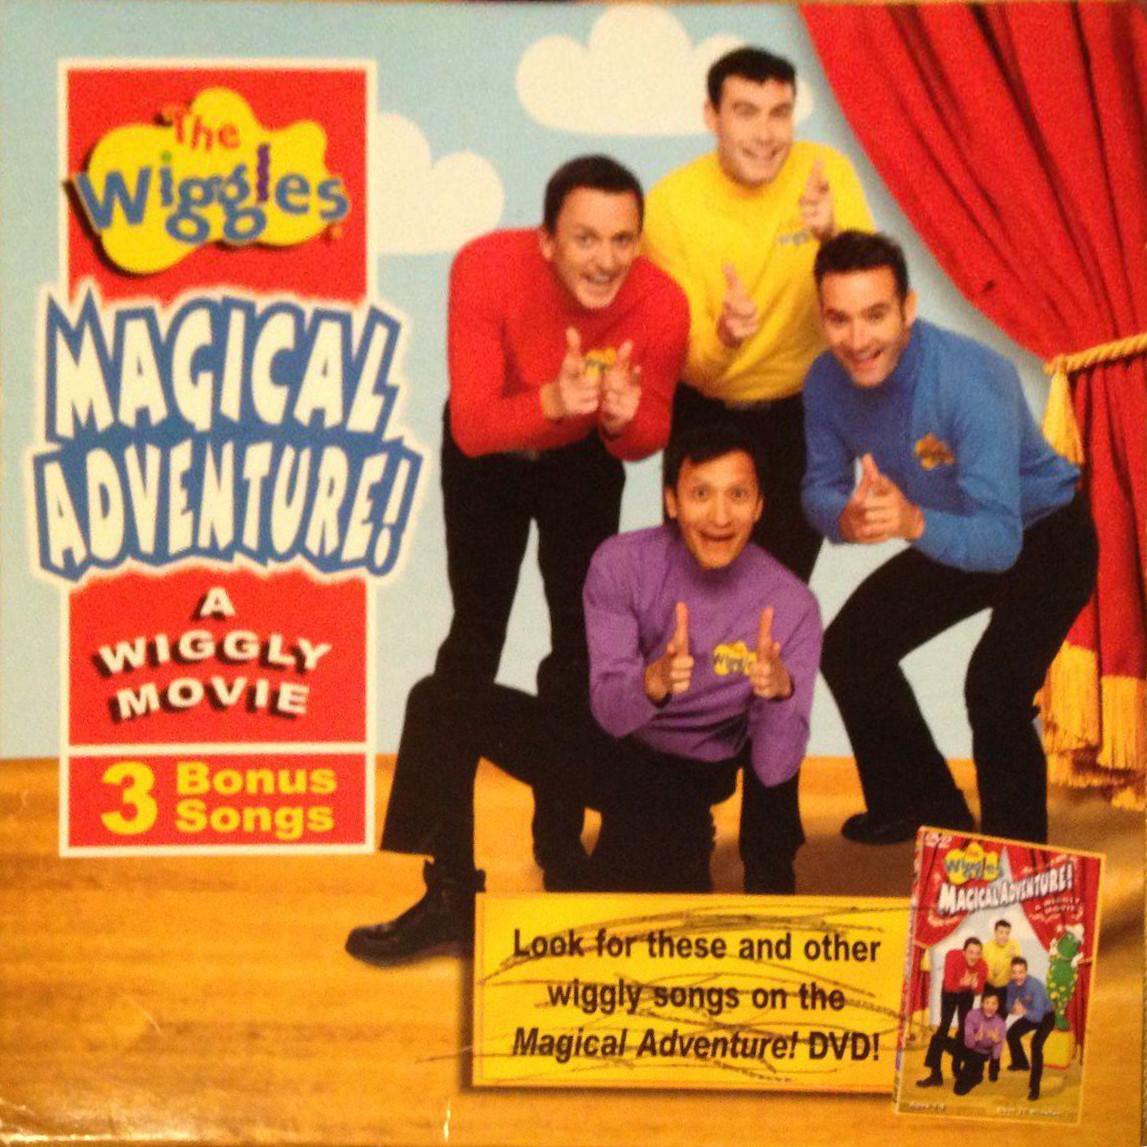 Magical Adventure! A Wiggly Movie: 3 Bonus Songs